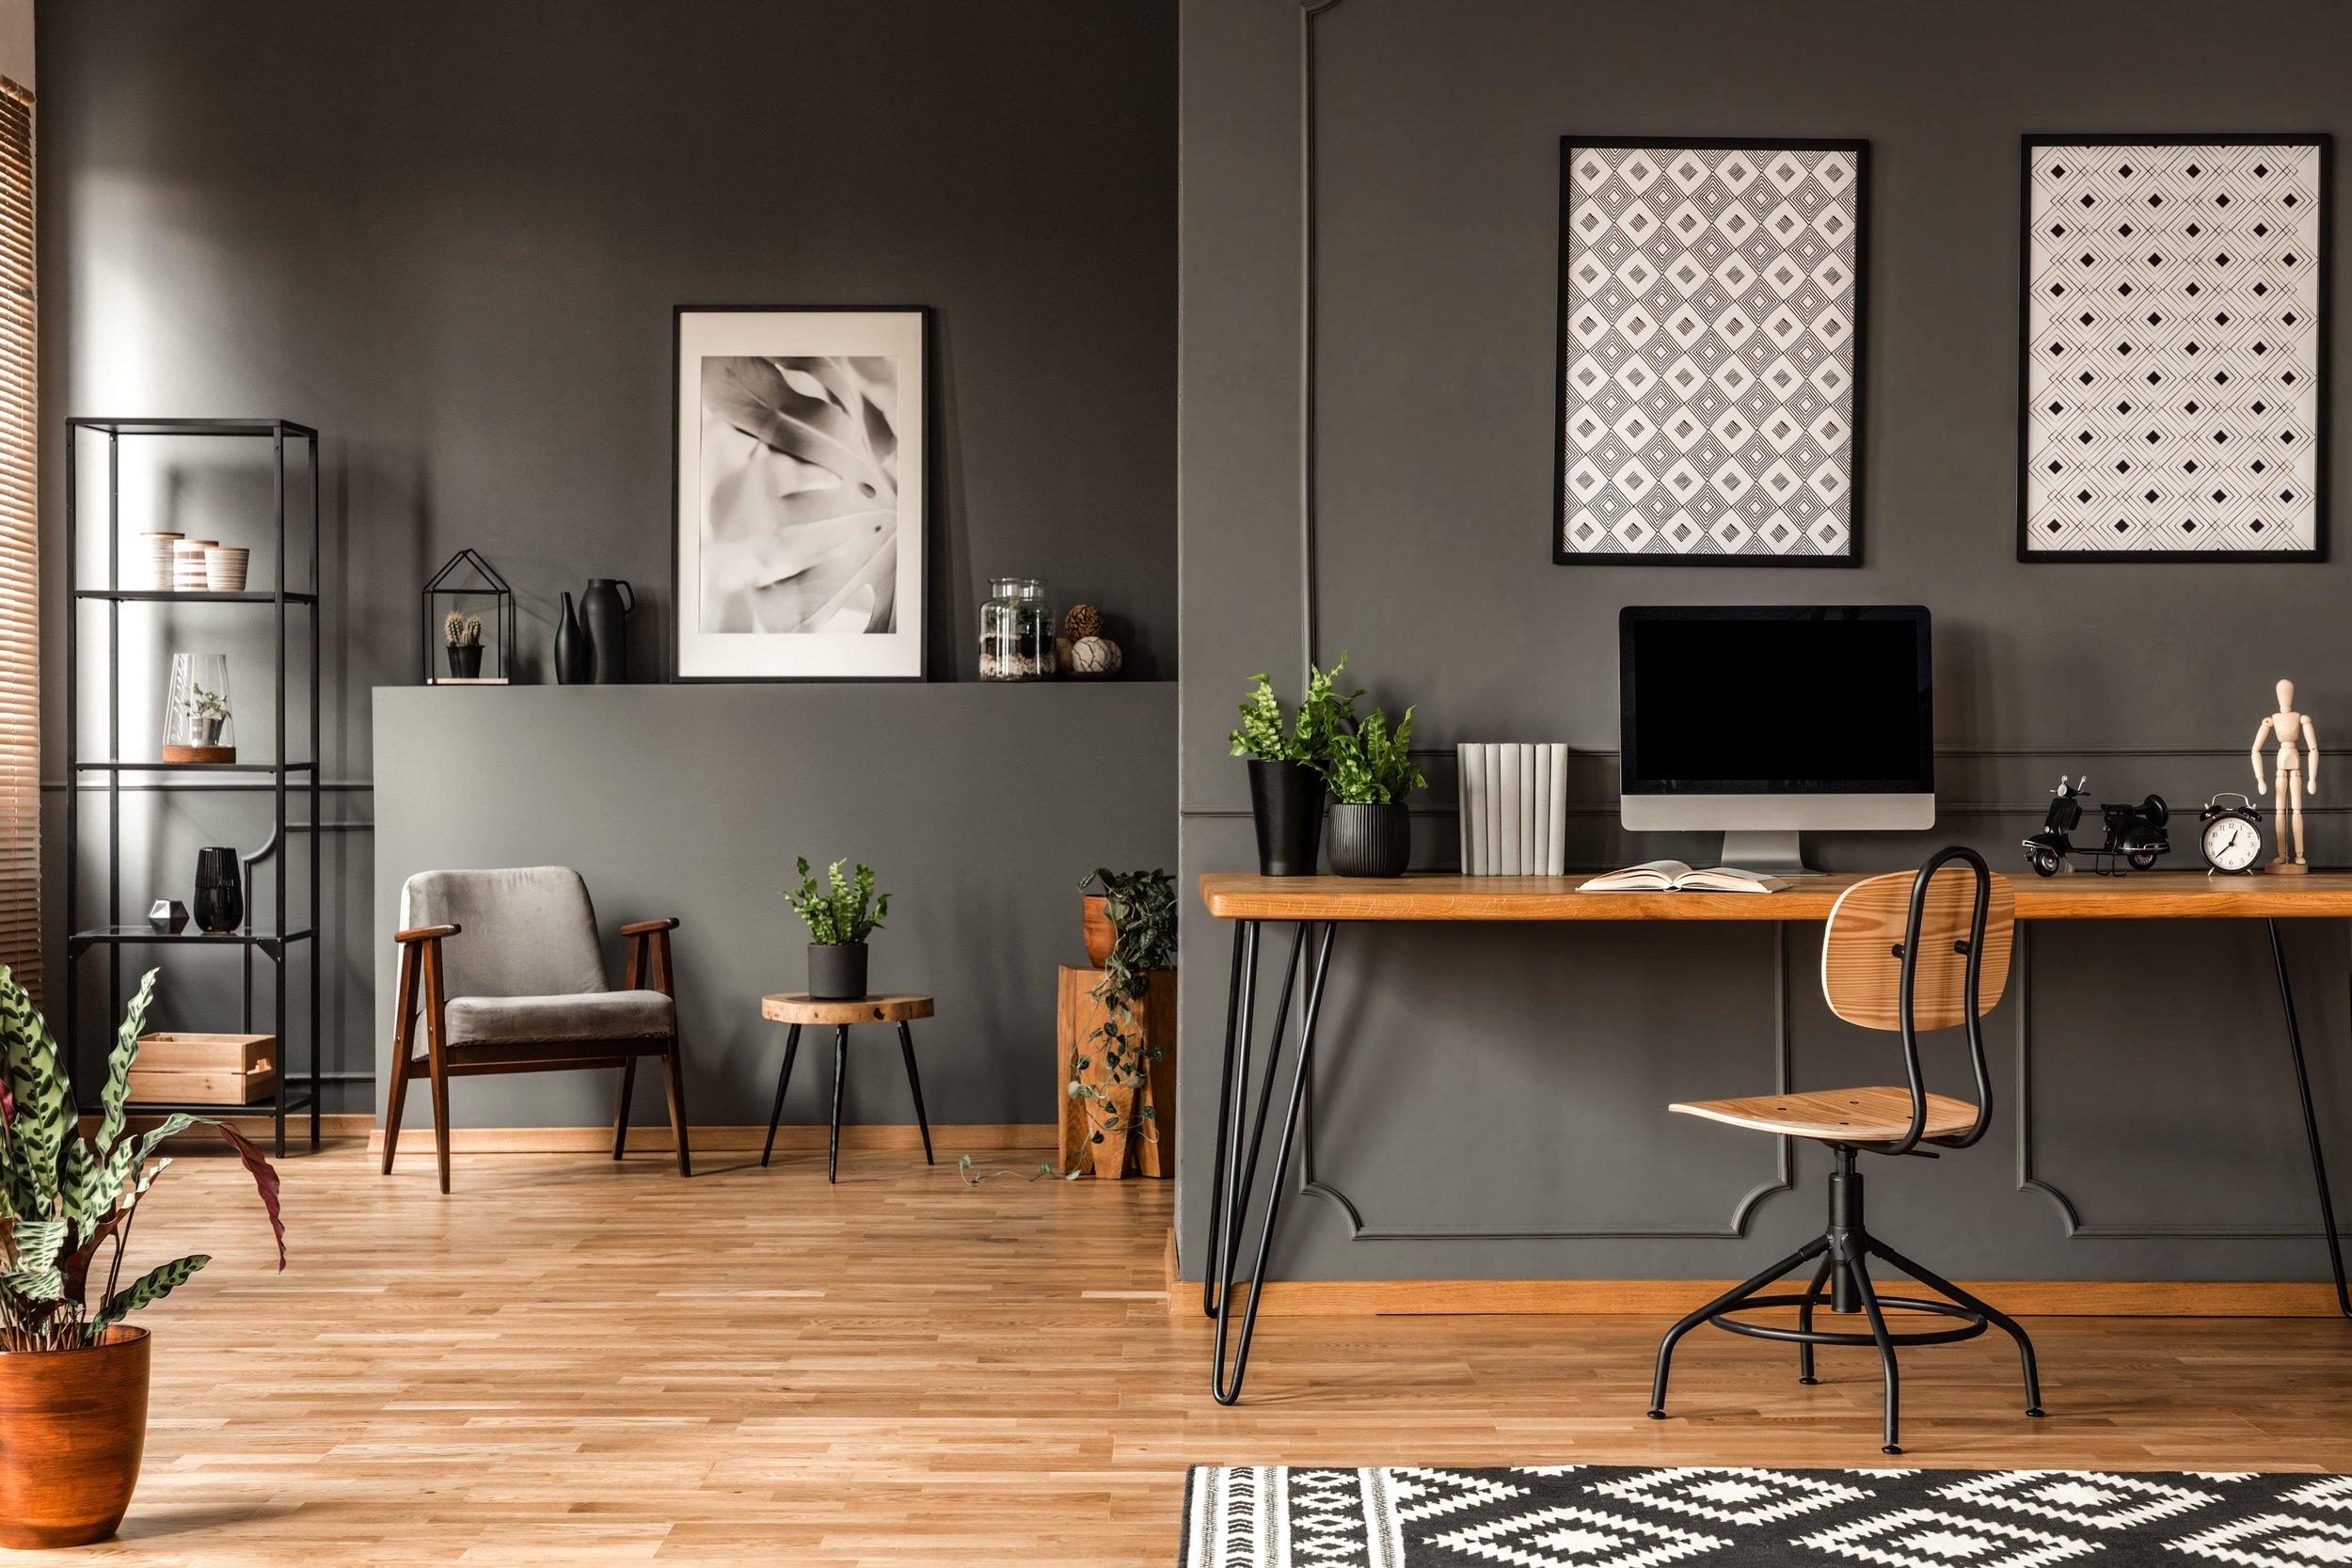 grey-home-office-interior-6PUJVR8.jpg